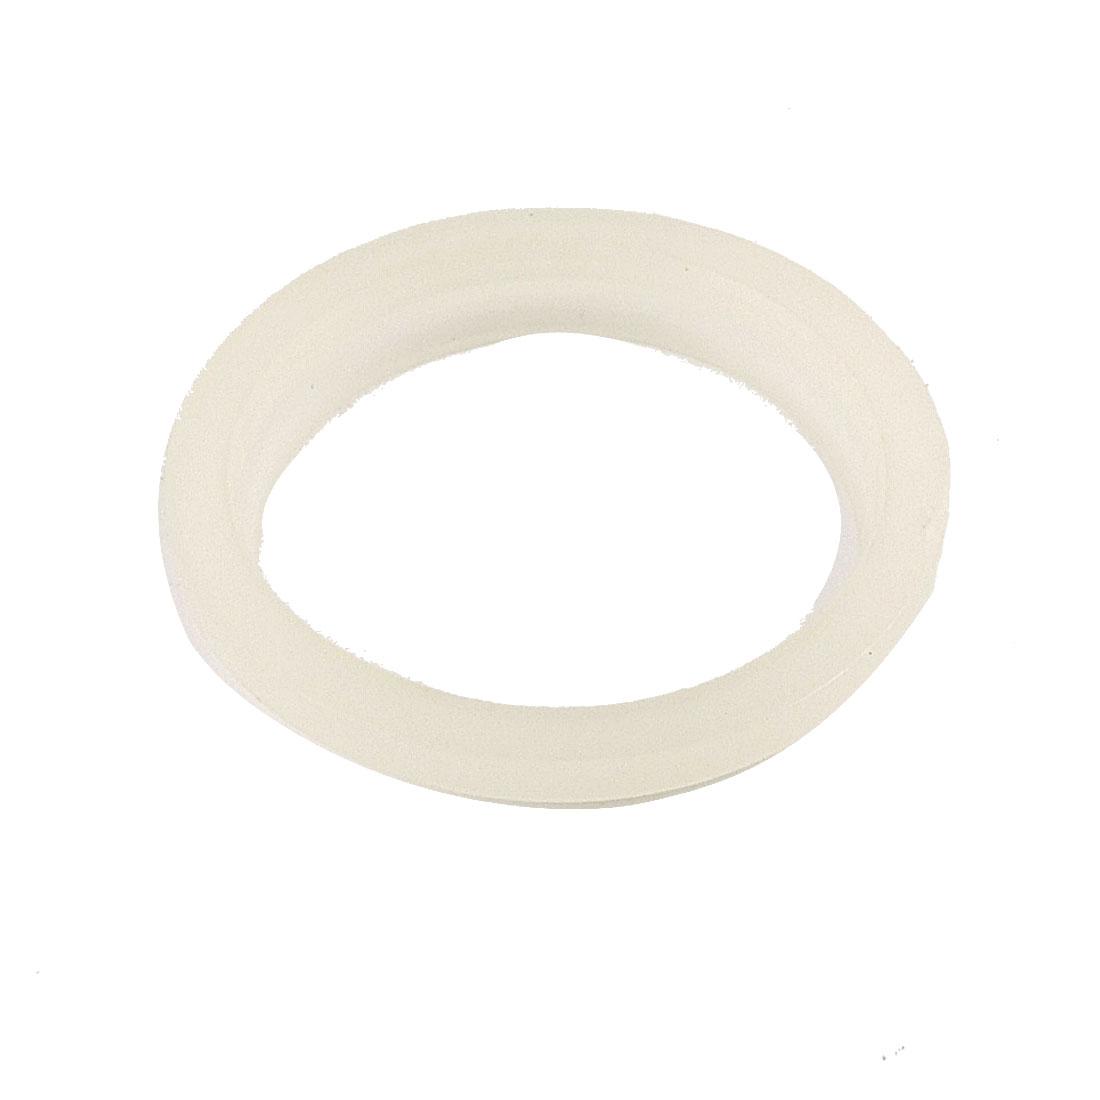 50mm x 62mm x 5mm x 10mm Polyurethane Gasket Dust Seal for Air Cylinder